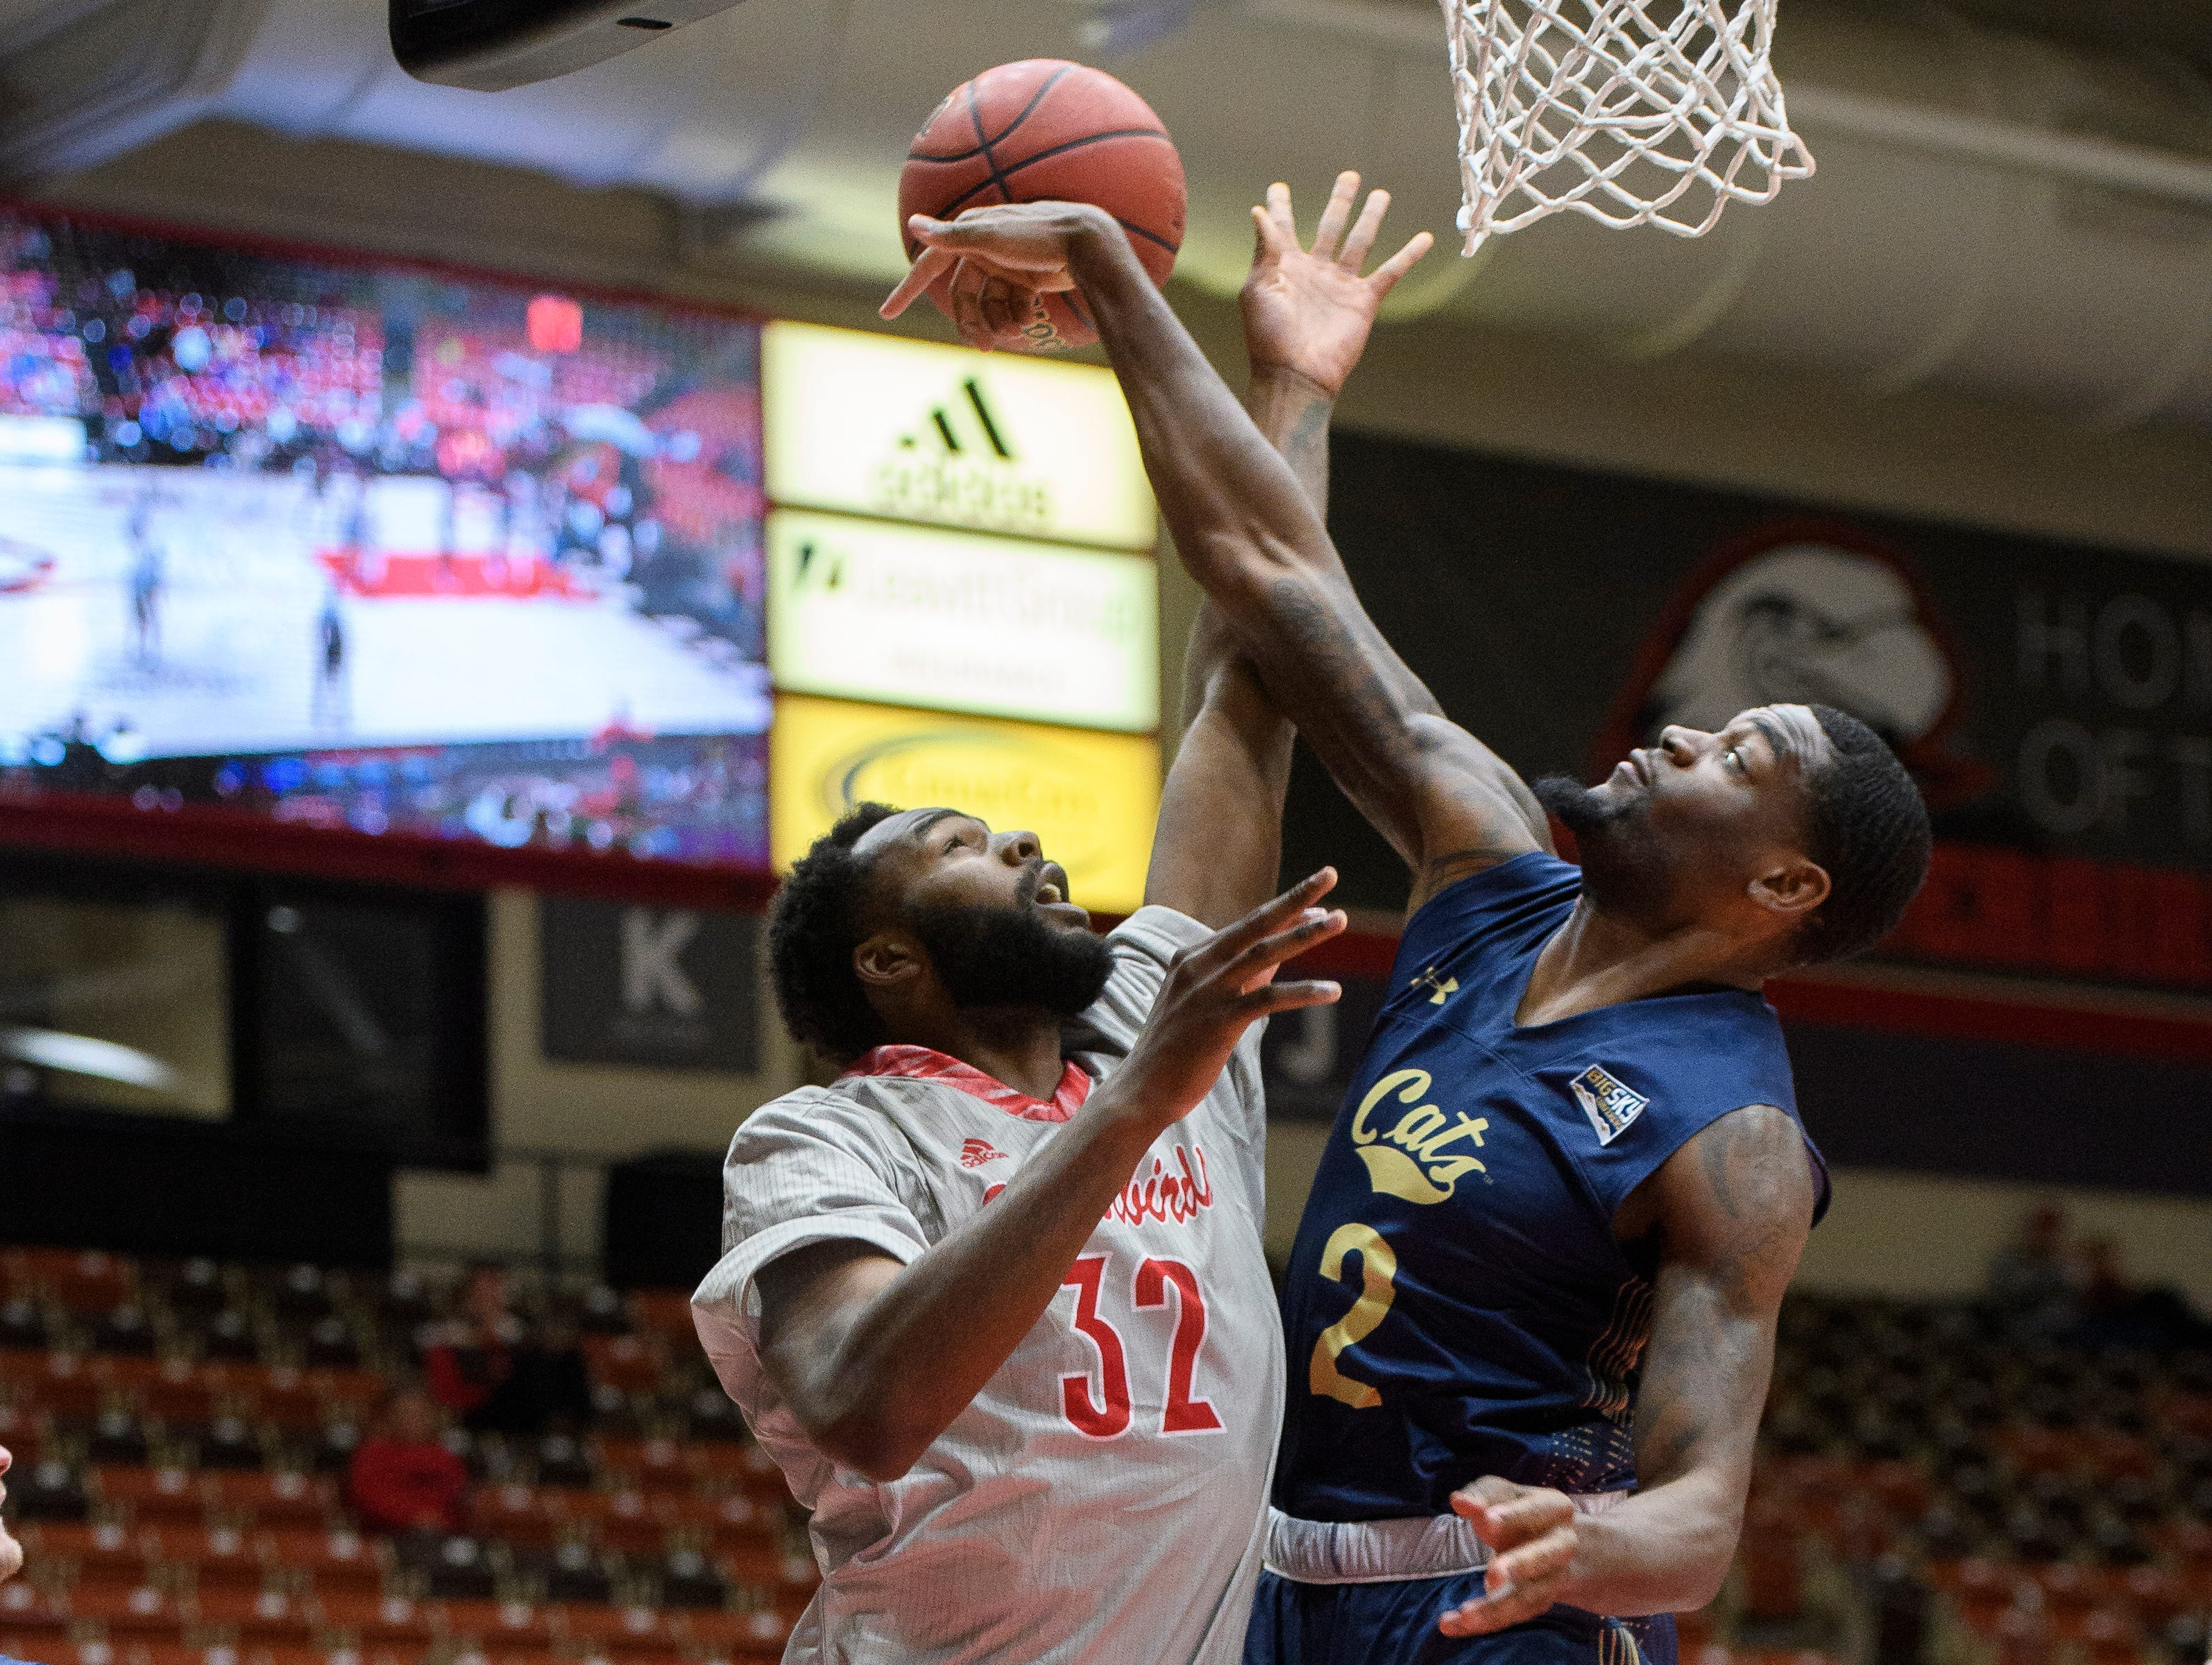 Montana State University senior Keljin Blevins (2) blocks the shot of Southern Utah University junior Andre Adams (32) in the America First Event Center Saturday, December 29, 2018. SUU lost, 92-62.